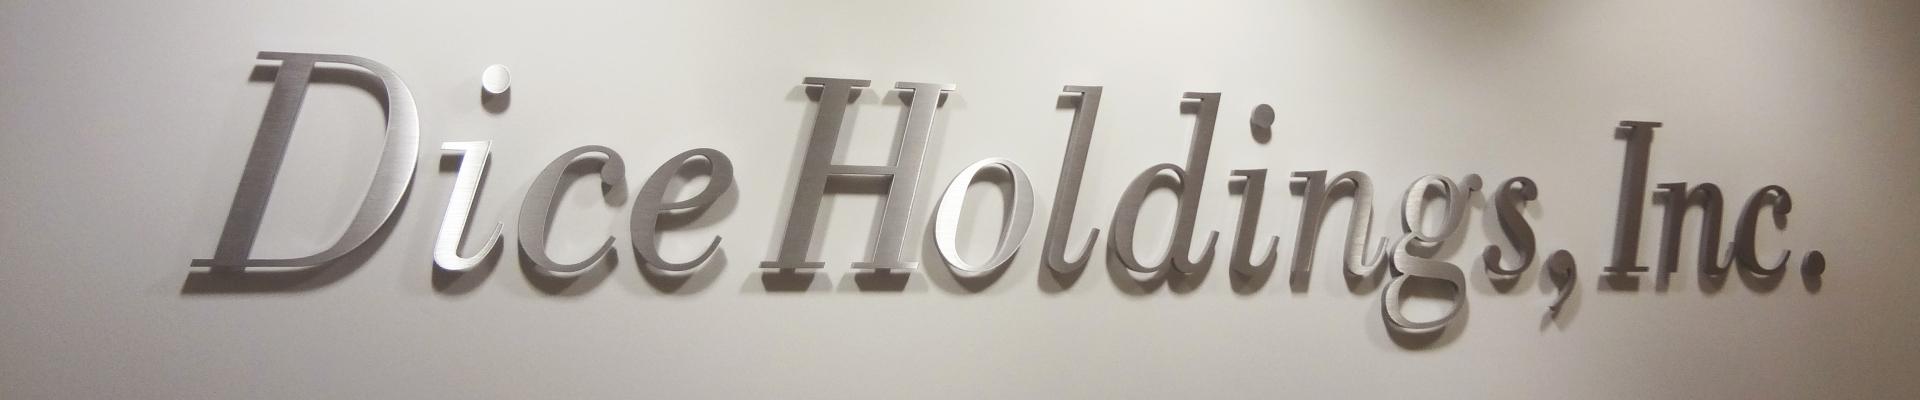 Dice Holdings, Inc